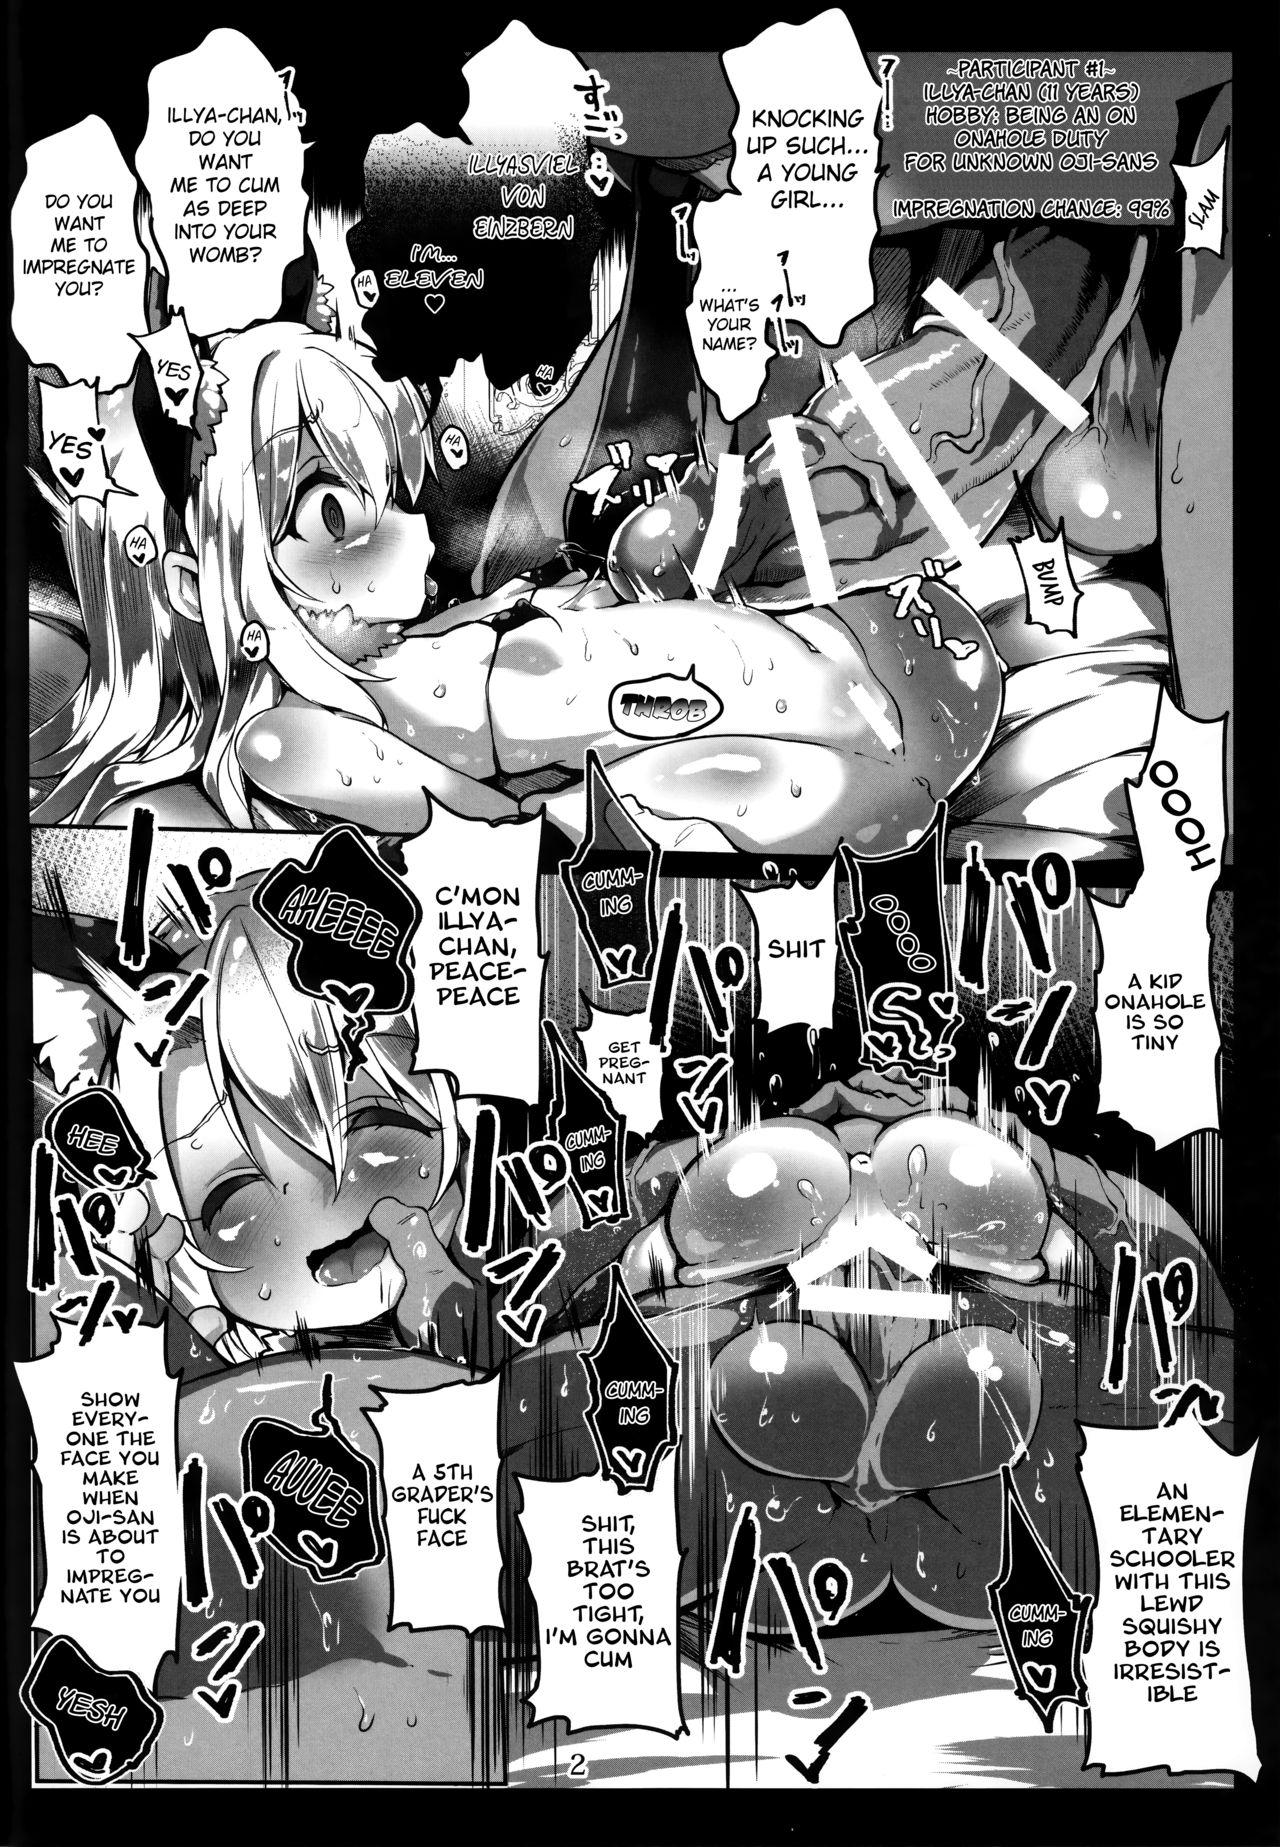 (C92) [Roubai-tei (atahuta)] Double Bind ~Seisou Seiatsu~ | Double Bind ~Testicular Suppression~ (Fate/kaleid liner Prisma Illya) [English] [Mongolfier] 2